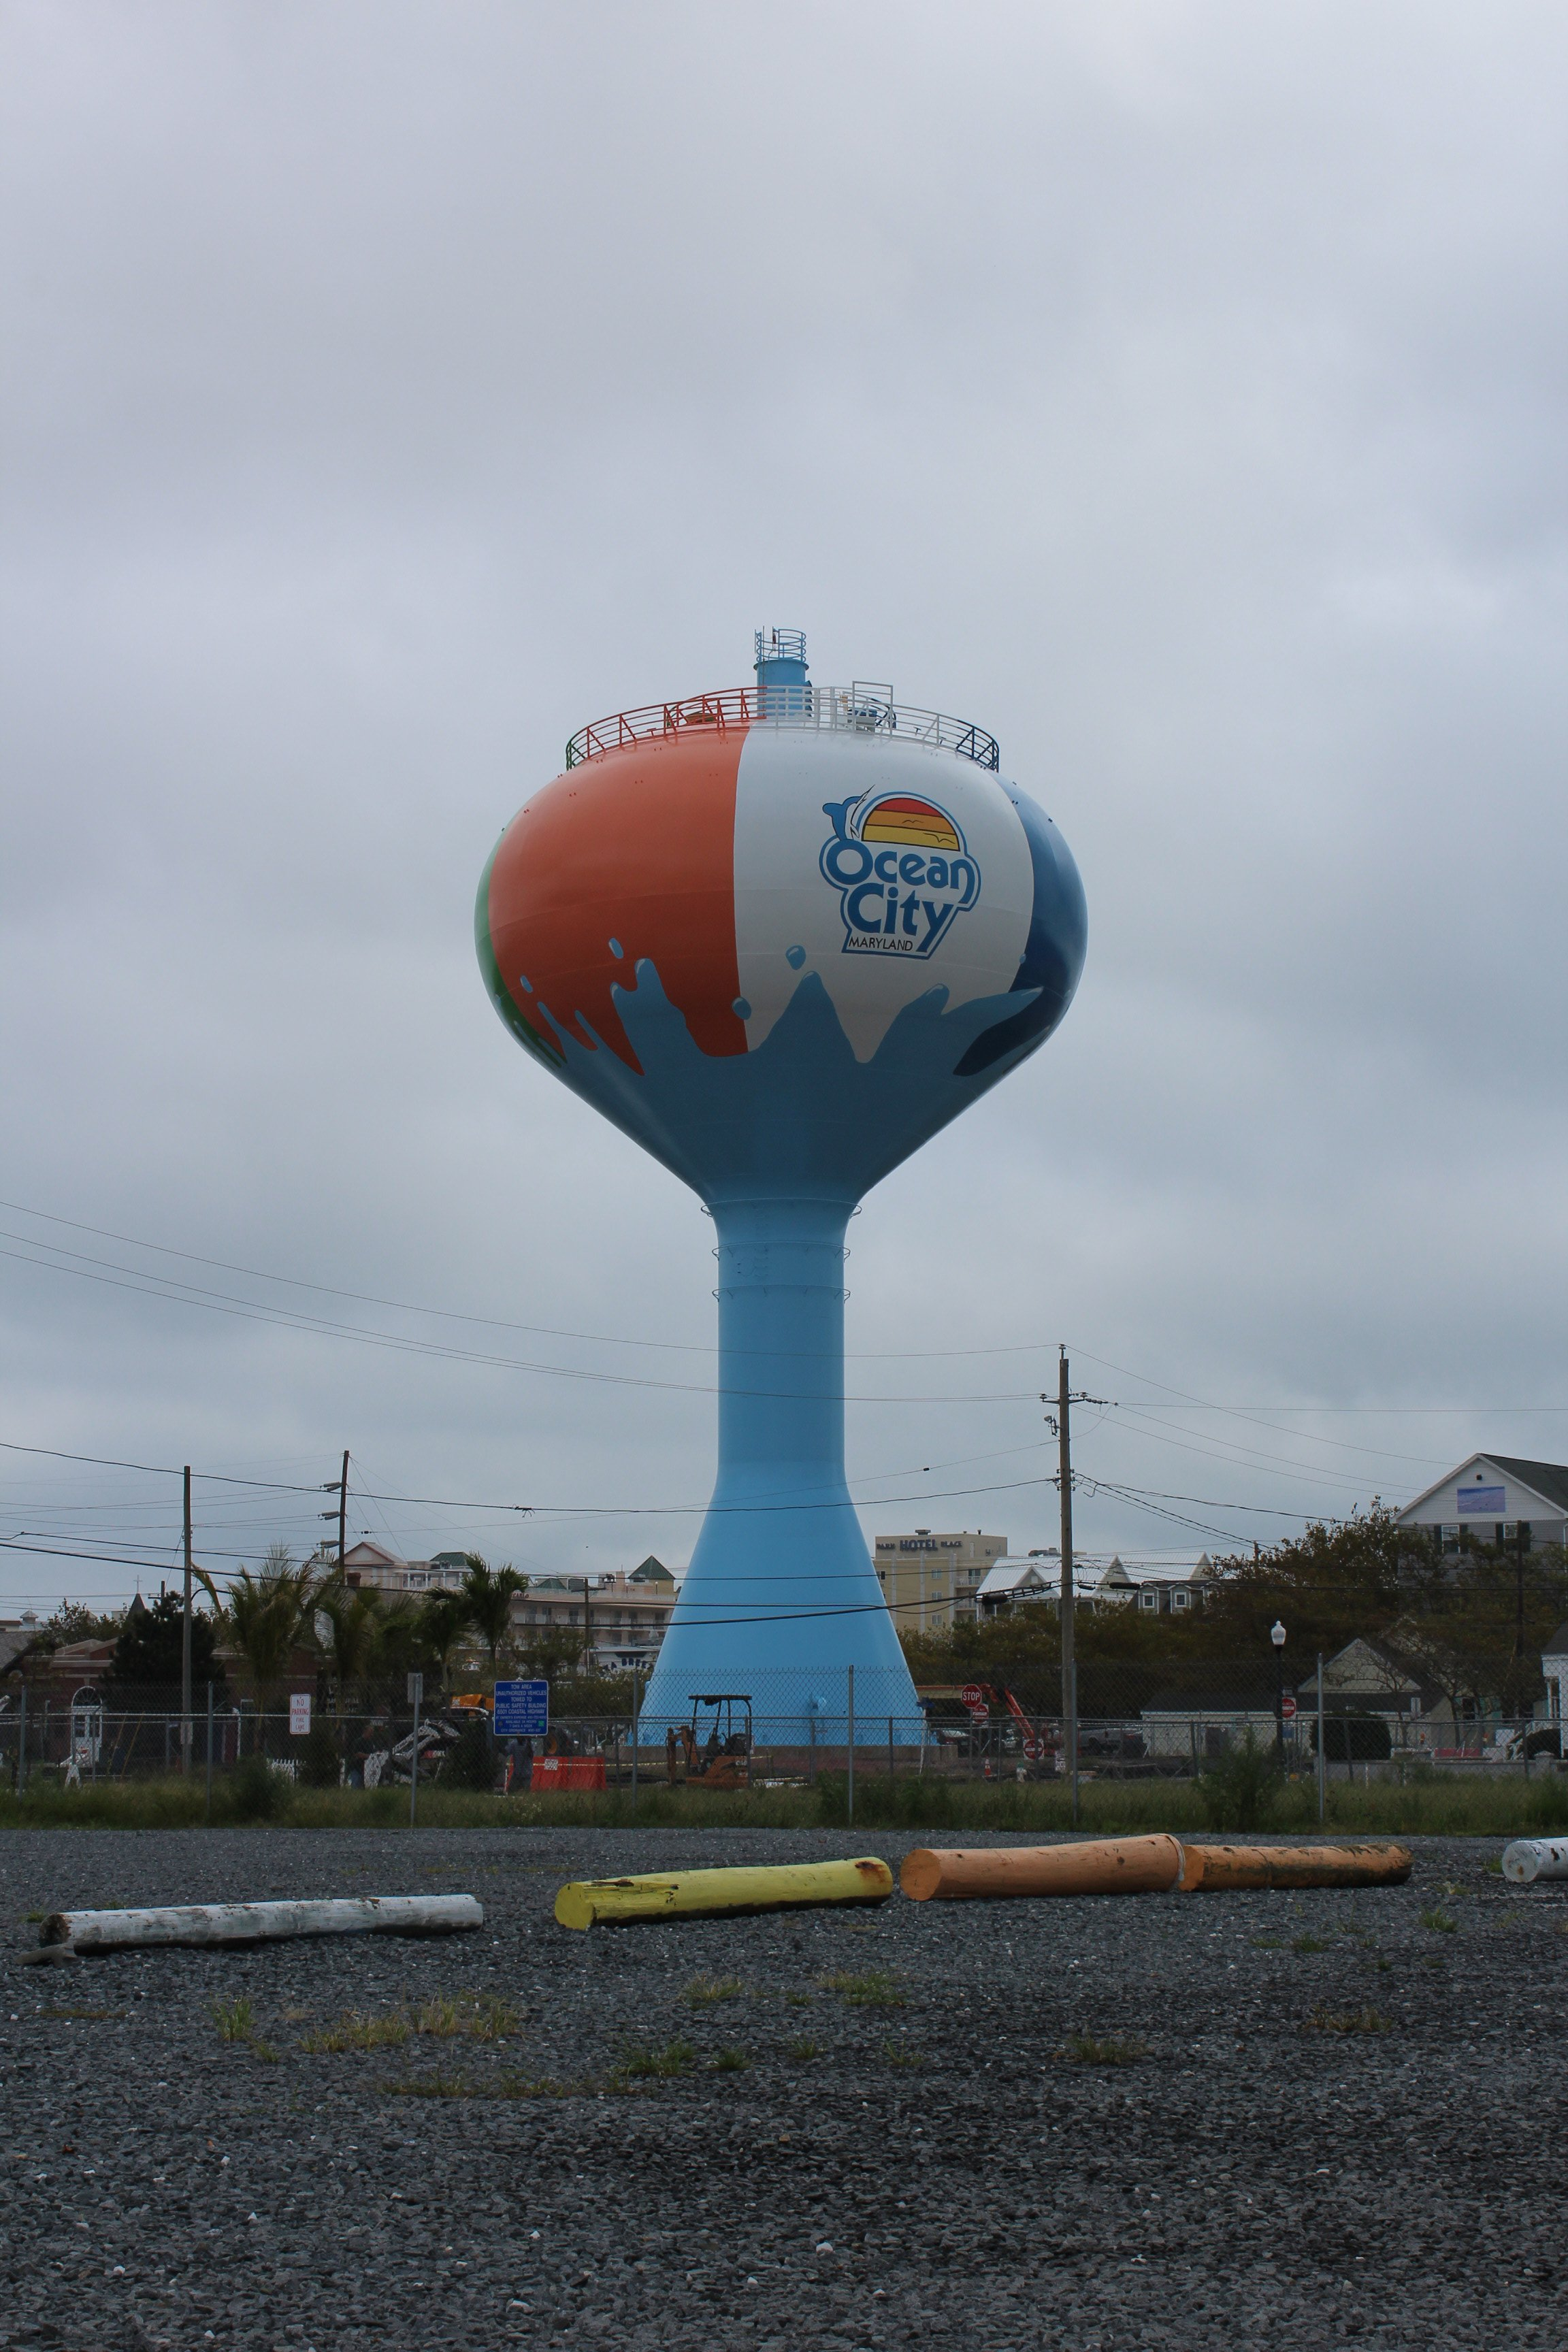 Ocean City S New Beach Ball Water Tower Shorebread